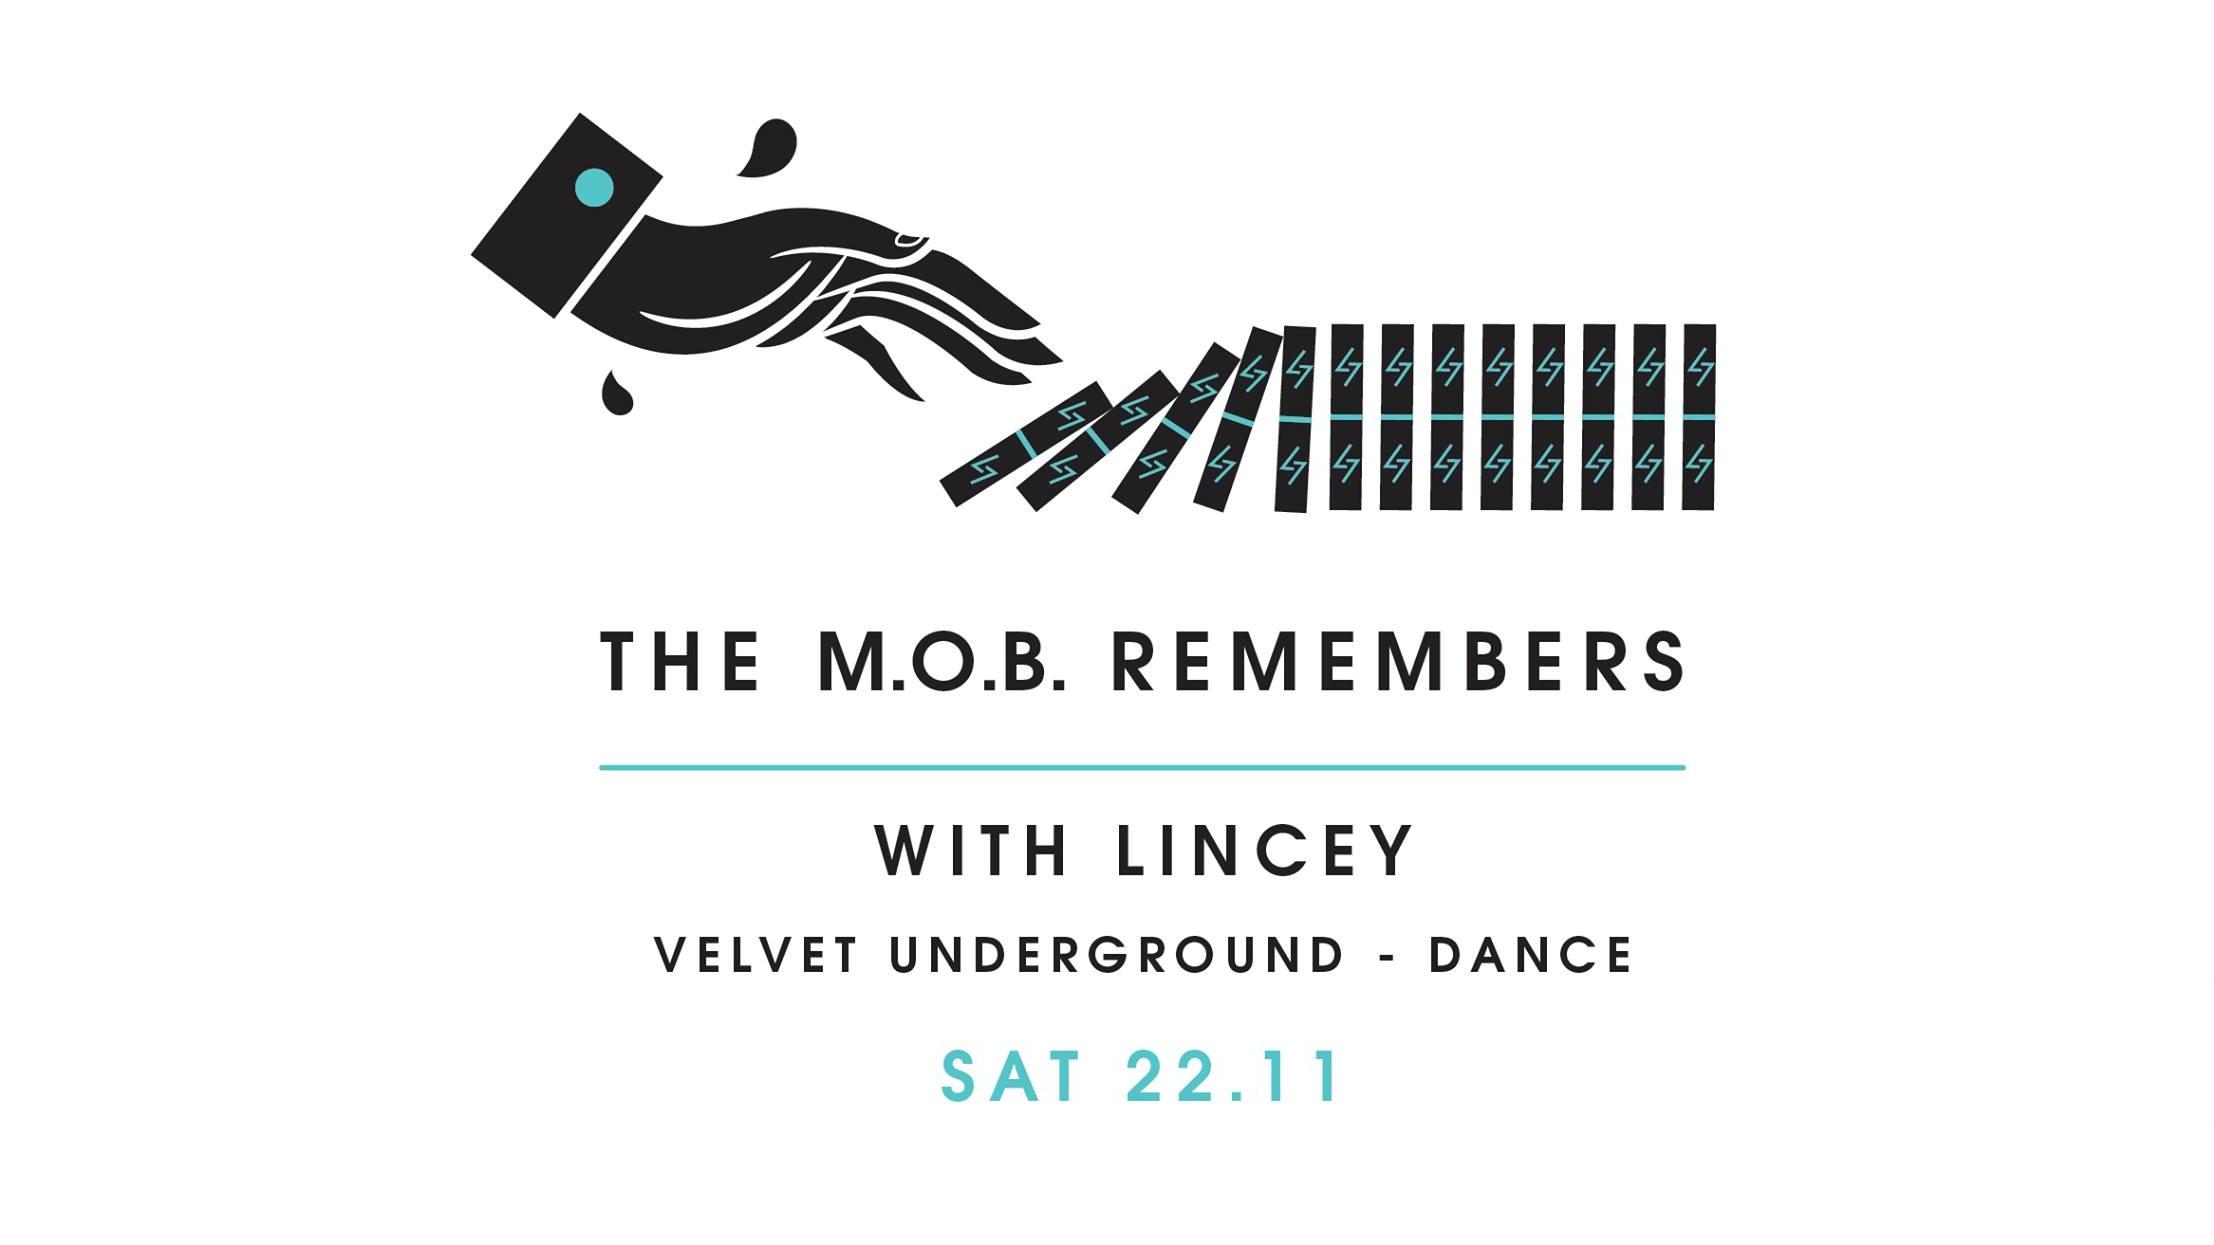 THE M.O.B. REMEMBERS